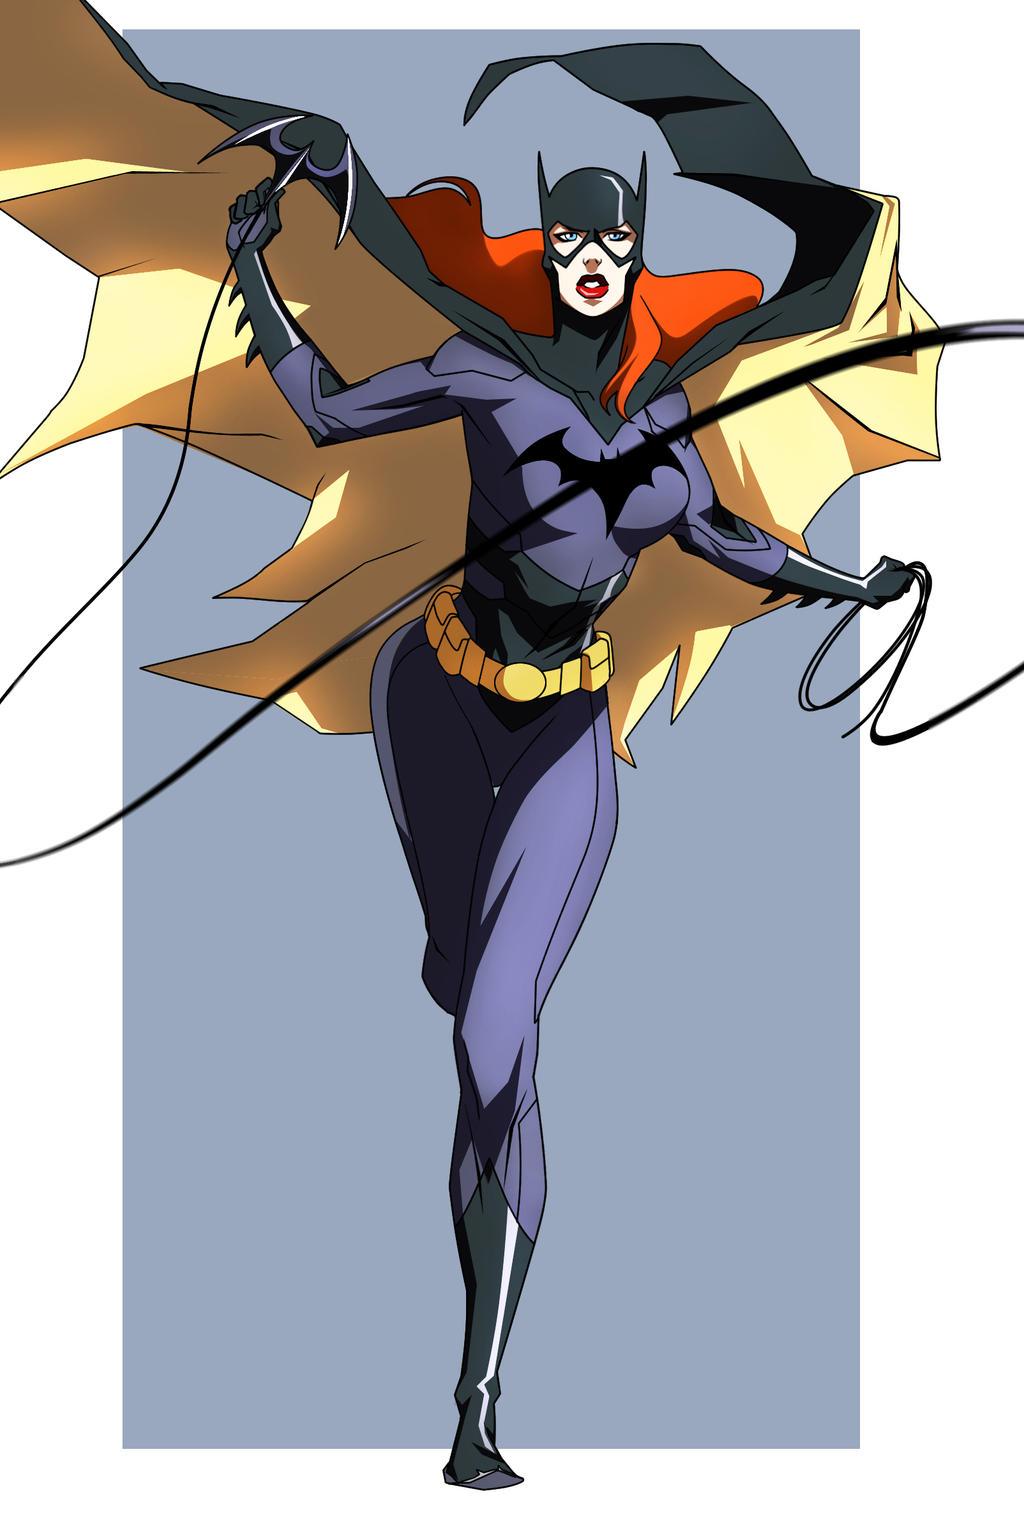 Young Justice Batgirl by msciuto on DeviantArt